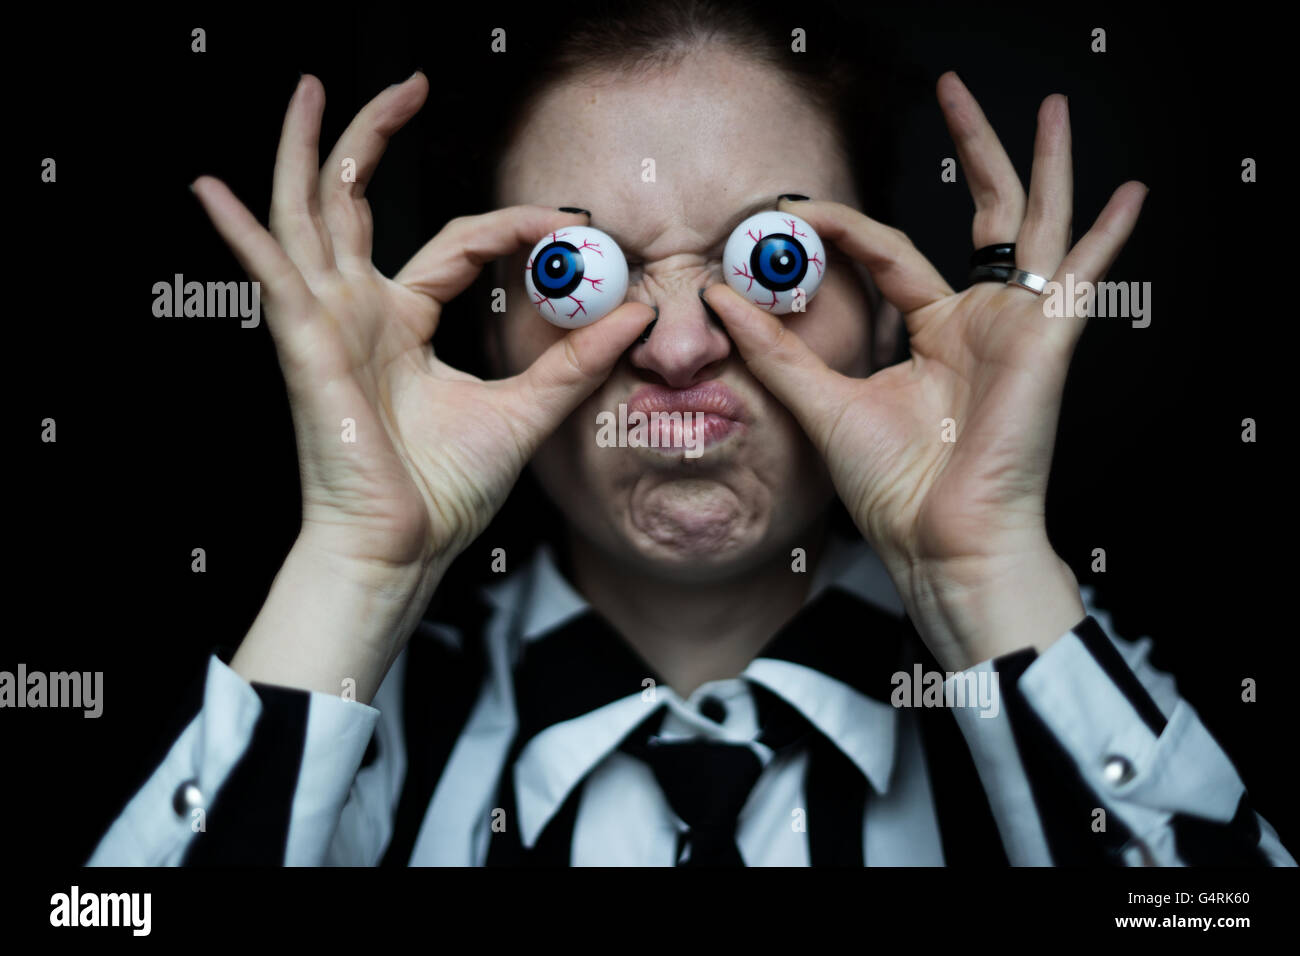 Woman grimacing, artificial eyes - Stock Image